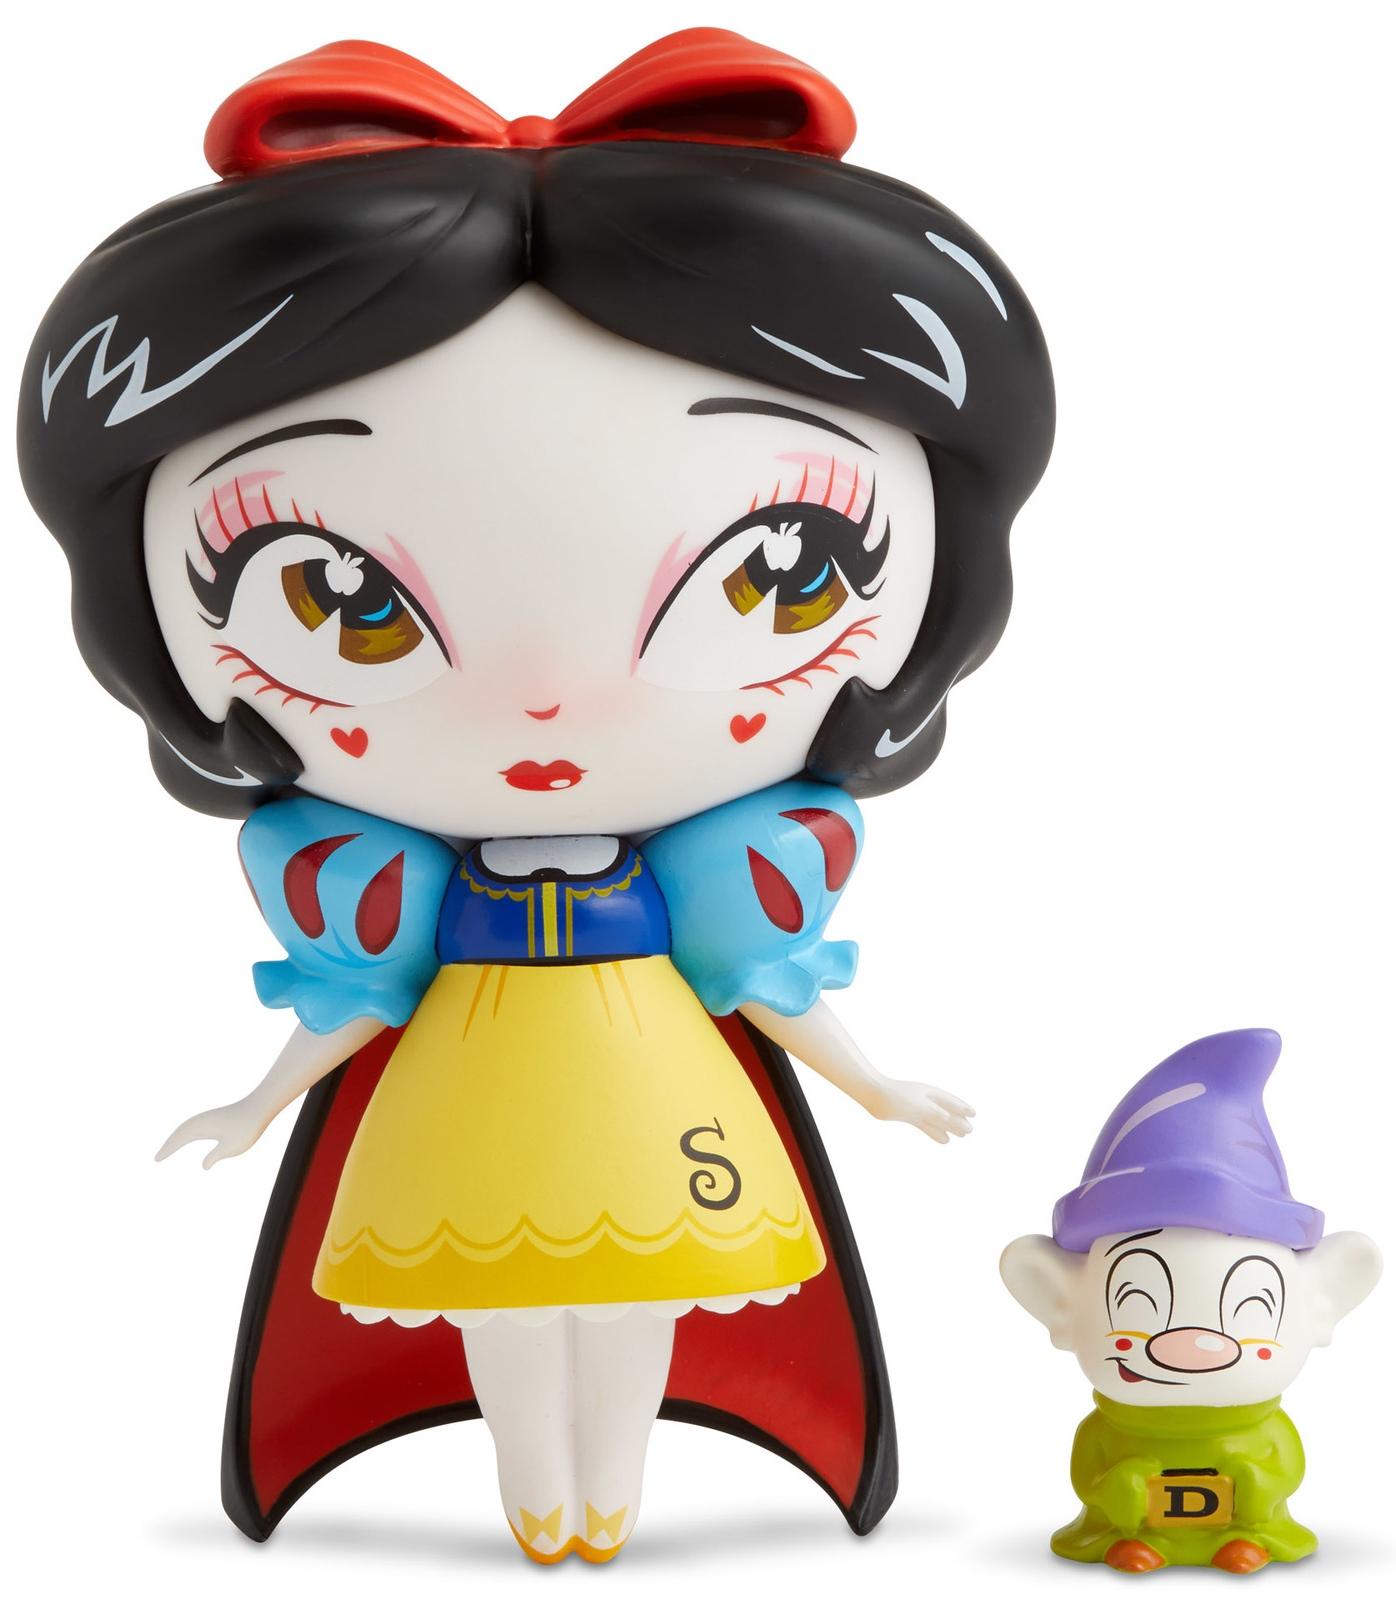 World of Miss Mindy 6003778 Snow White Vinyl Figurine